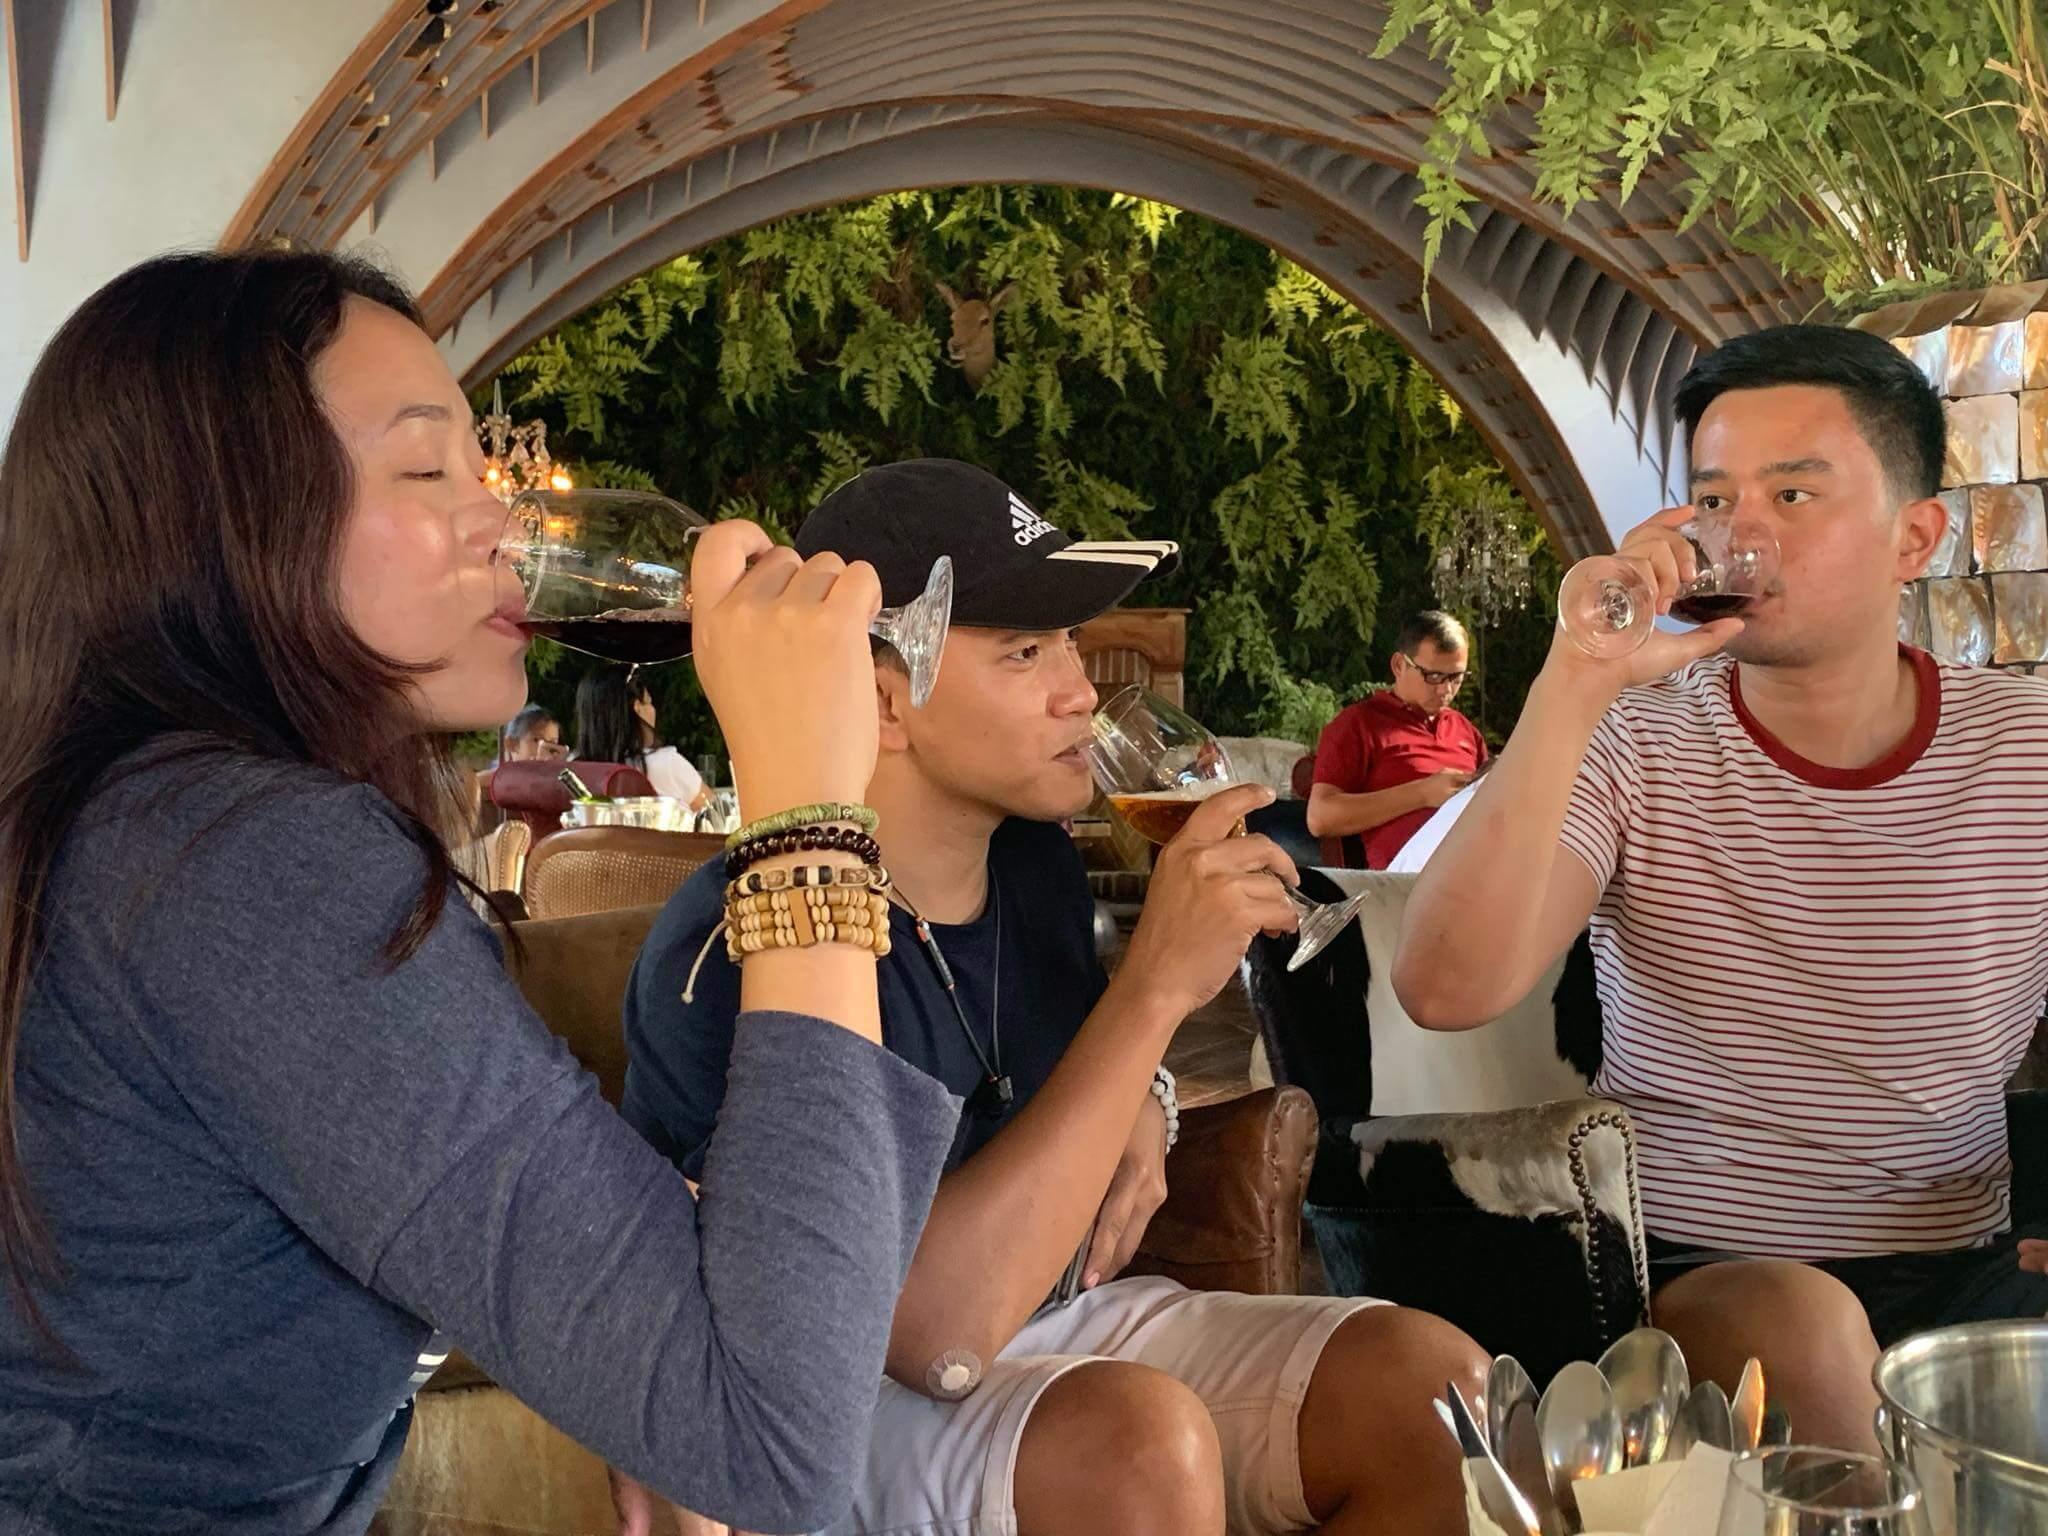 cebu travel guide 2020 (9)